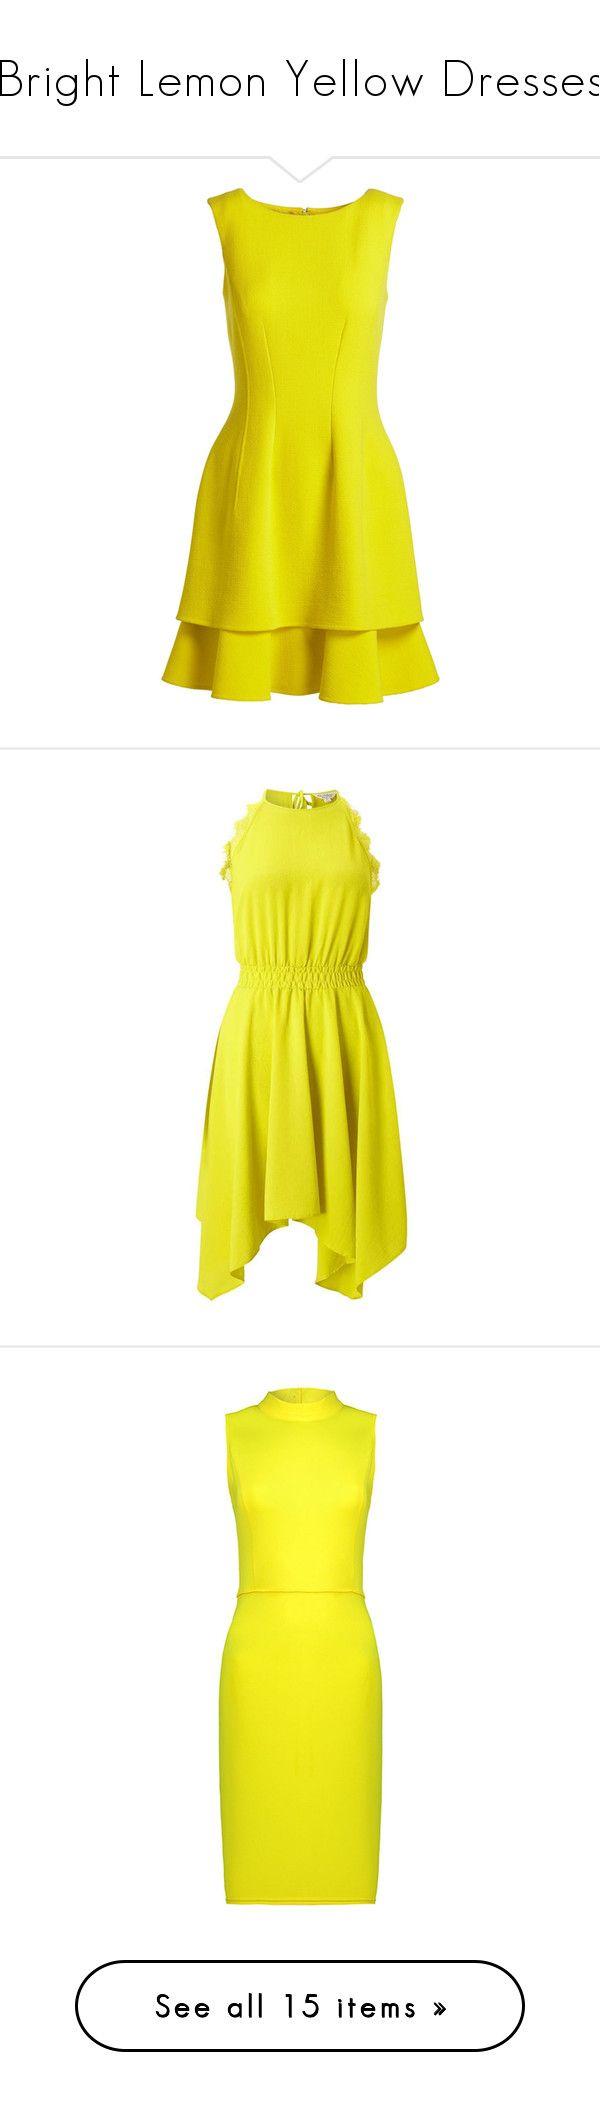 """Bright Lemon Yellow Dresses"" by tegan-b-riley on Polyvore featuring dresses, dresses 3, vestidos, layered dress, oscar de la renta dresses, zip dress, sleeveless a line dress, round neck sleeveless dress, chartreuse and yellow fit and flare dress"